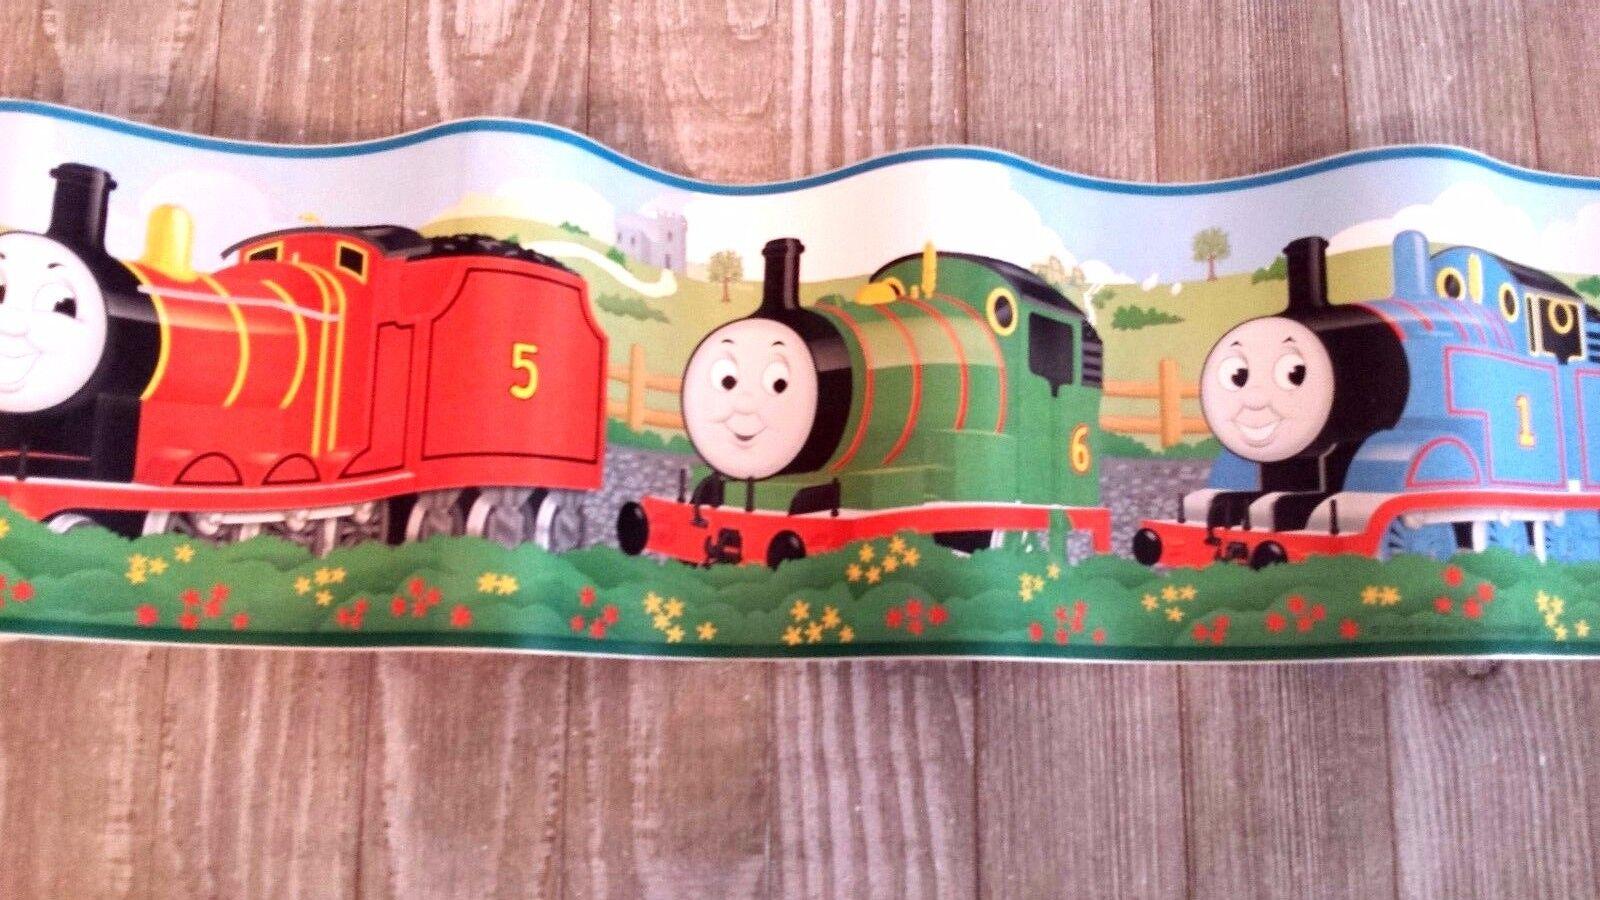 Wall border roll Thomas the train James nursery border peel /& stick 5 yd new